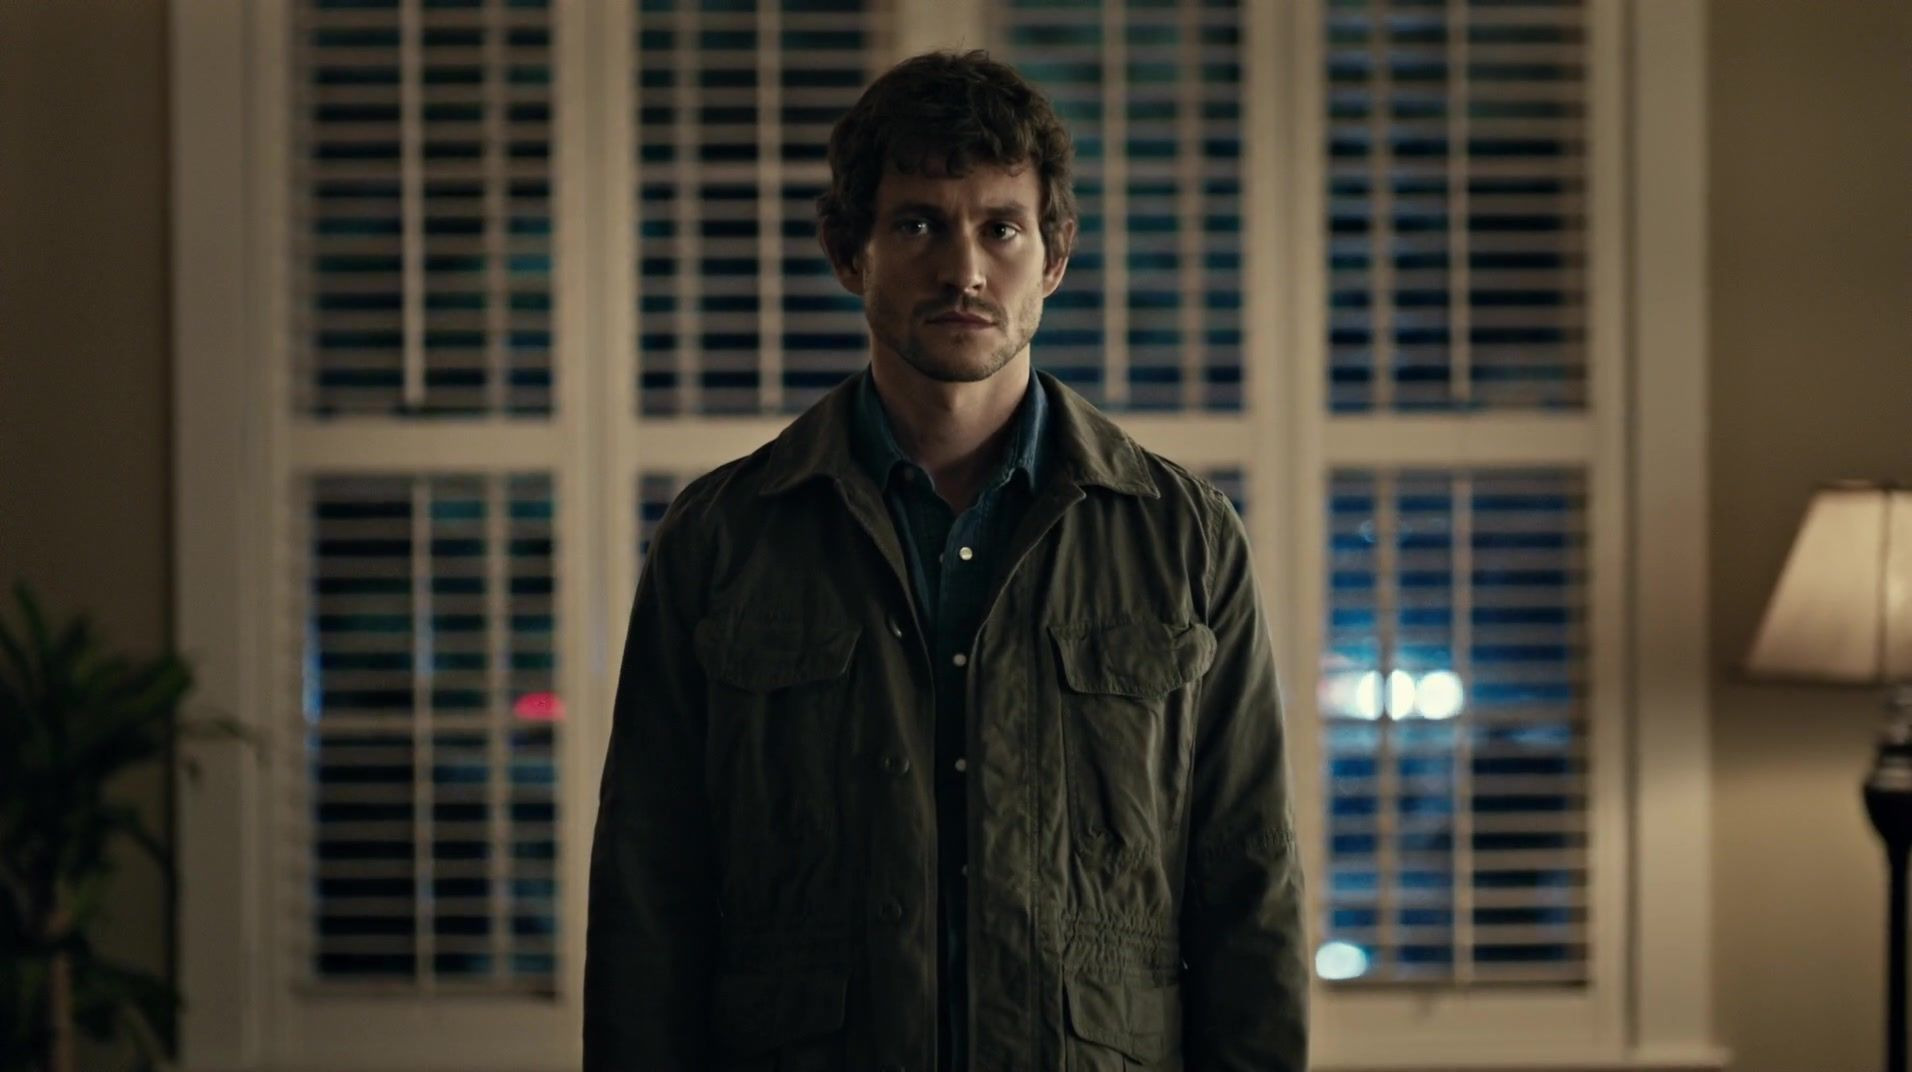 Hannibal — s01e01 — Apéritif